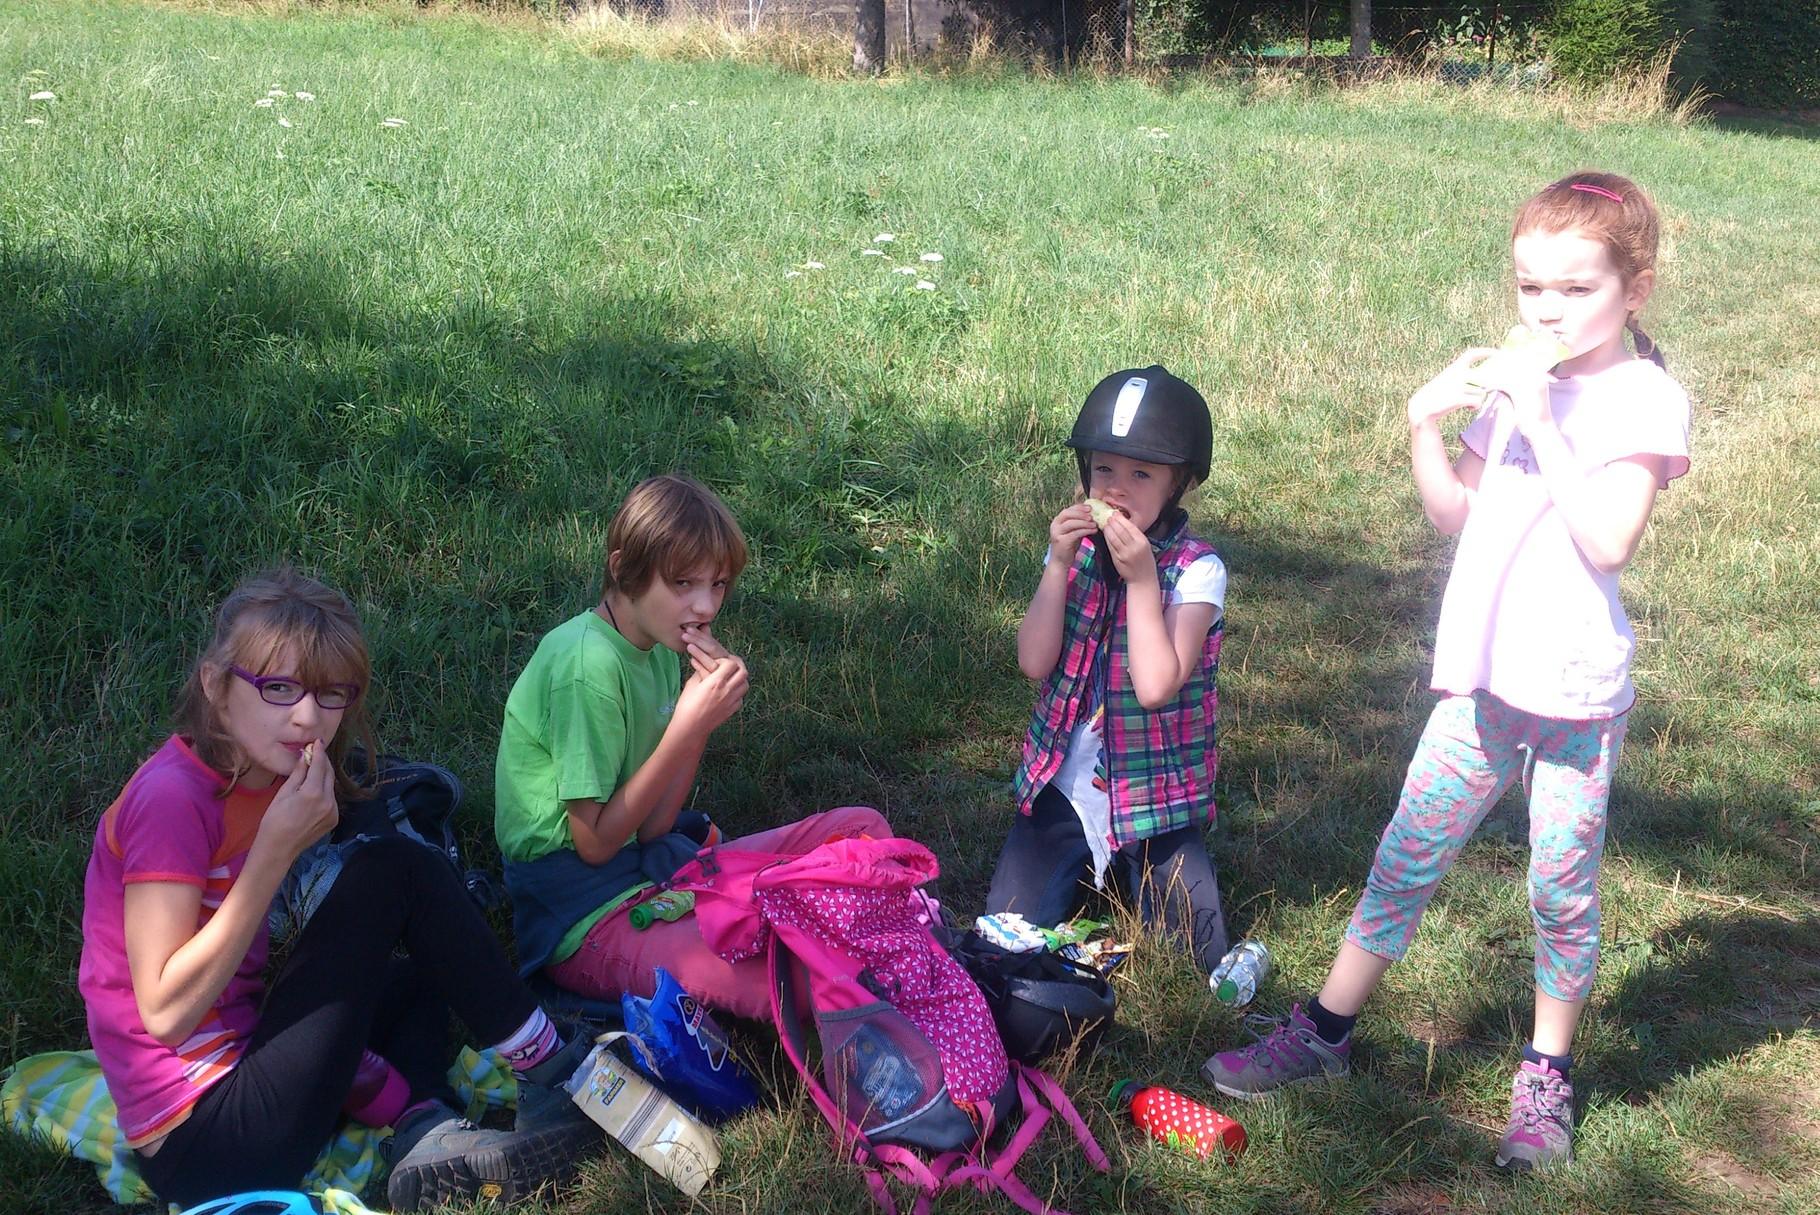 Picknick auf dem Schönberg